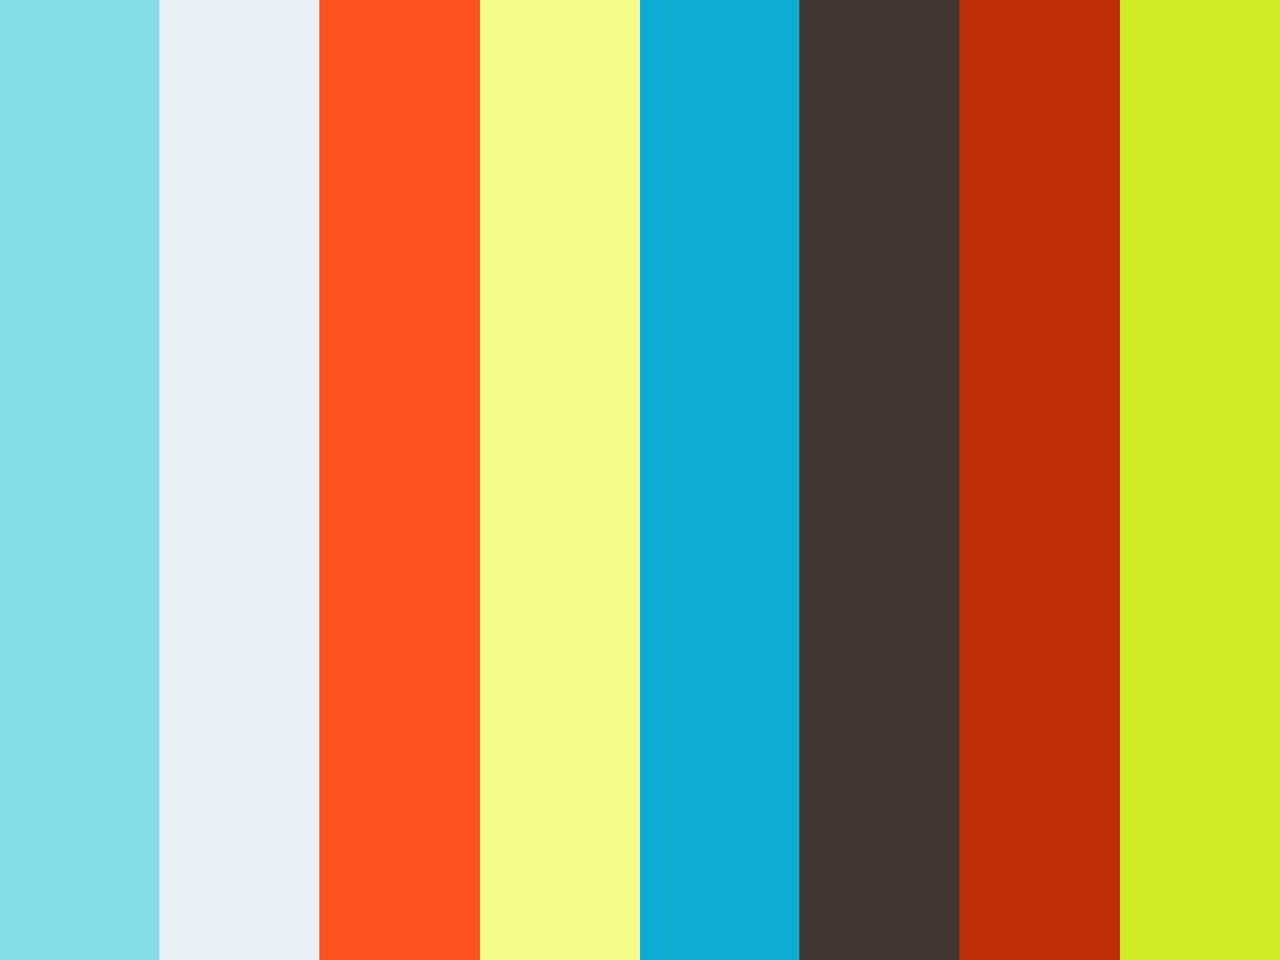 Molokai Covid19 Update - Friday, May 22, 2020